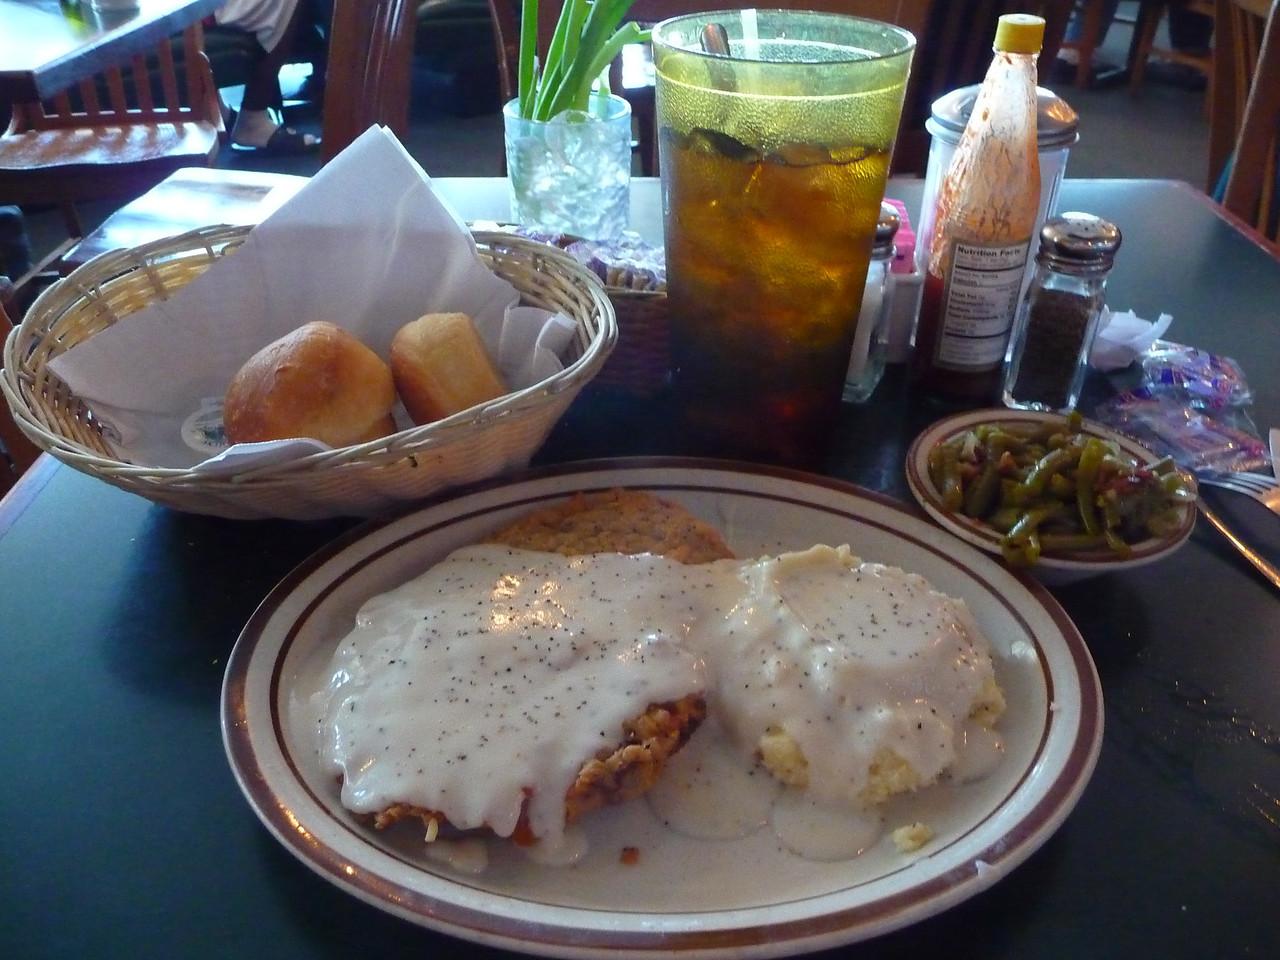 Chicken fried steak at Po Melvin's, Irving, TX